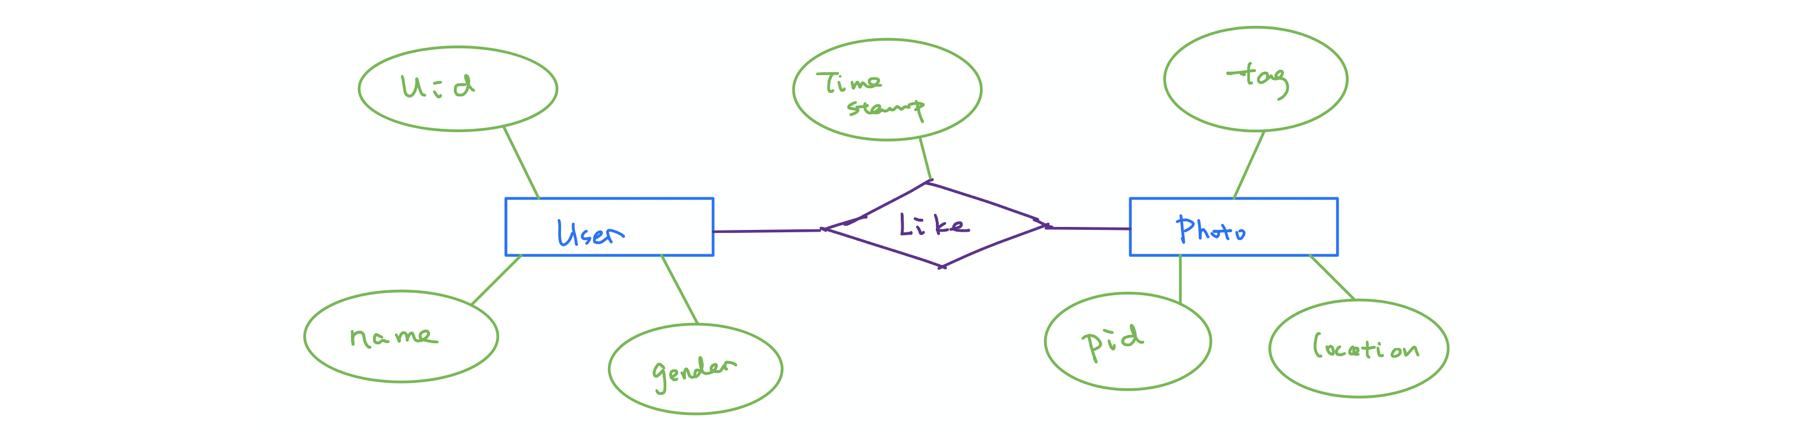 Relational Database 1   Installation Of Postgres And Pgadmin